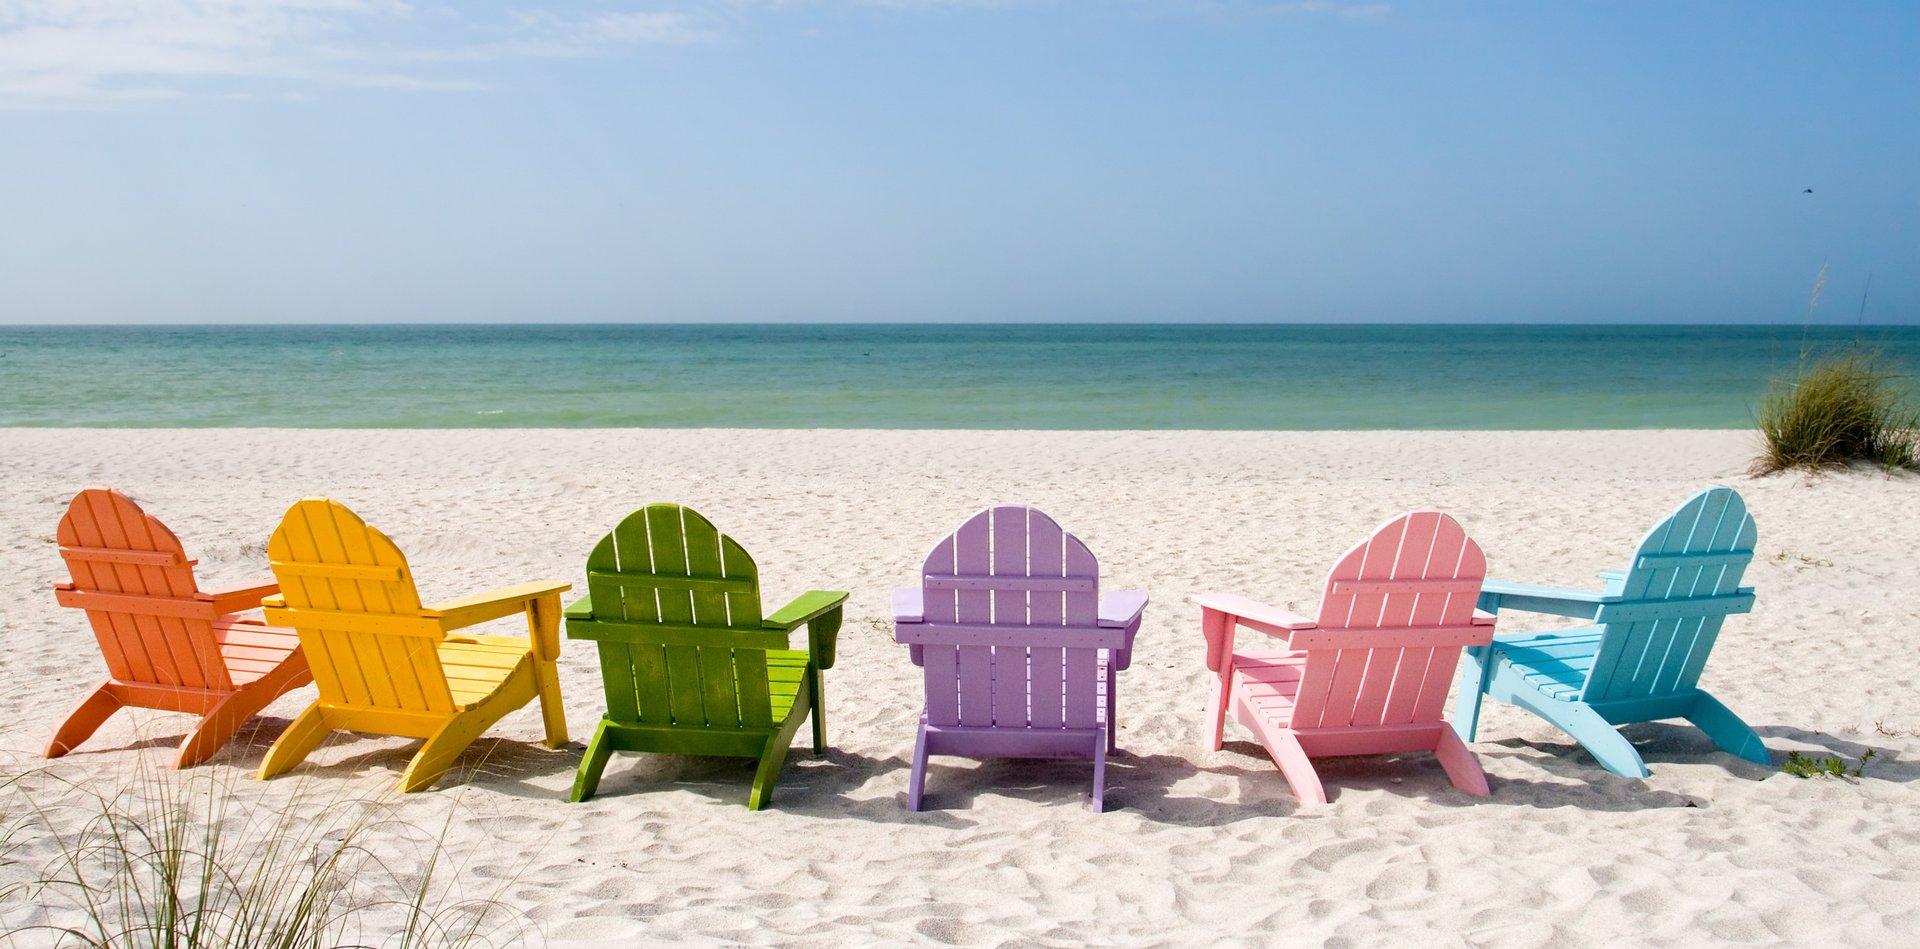 south-carolina-beach-chairs-rainbow-749455-edited.jpg